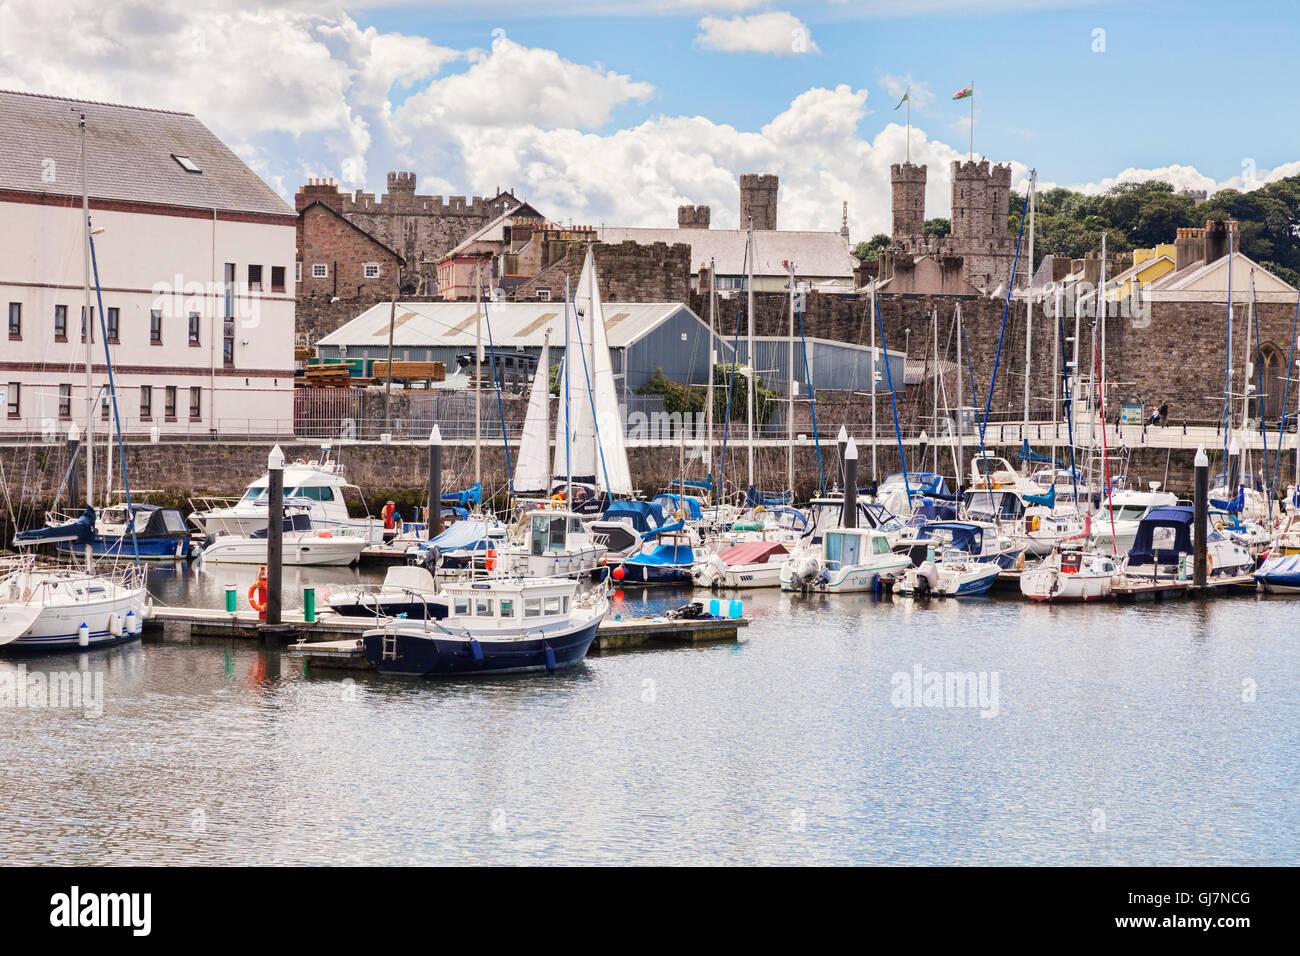 Victoria Dock, Caernarfon, Gwynedd, Wales, UK - Stock Image